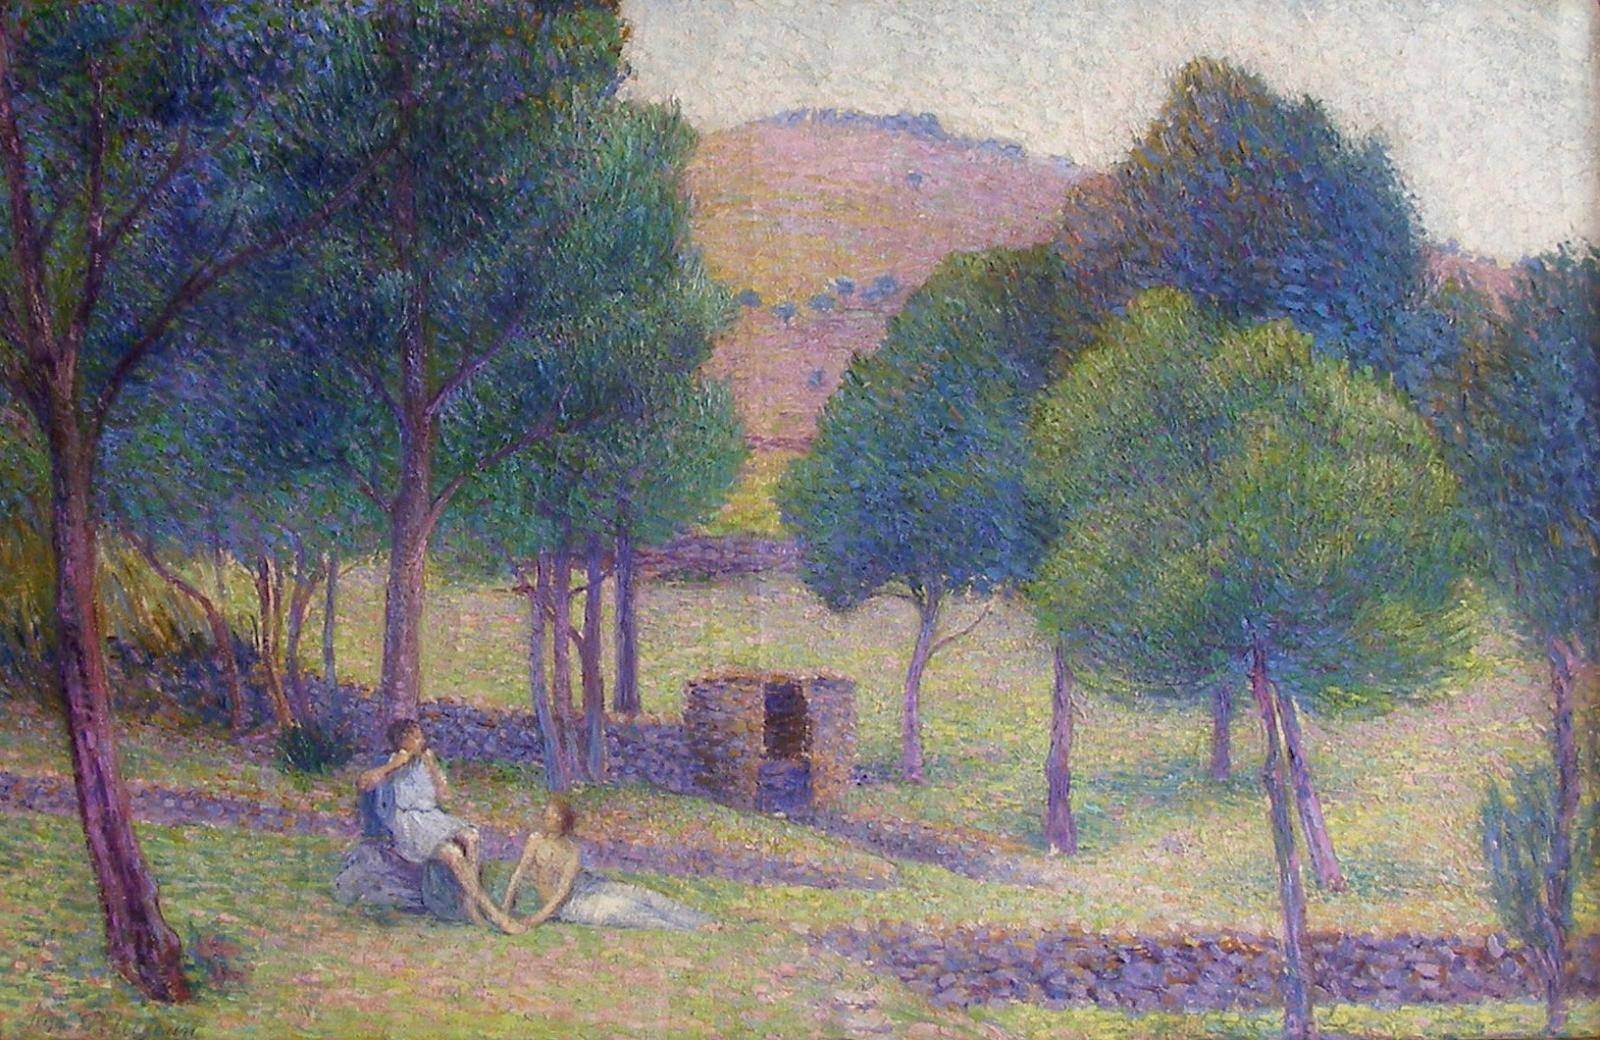 Hippolyte Petitjean, Paysage Idyllique, Circa 1902